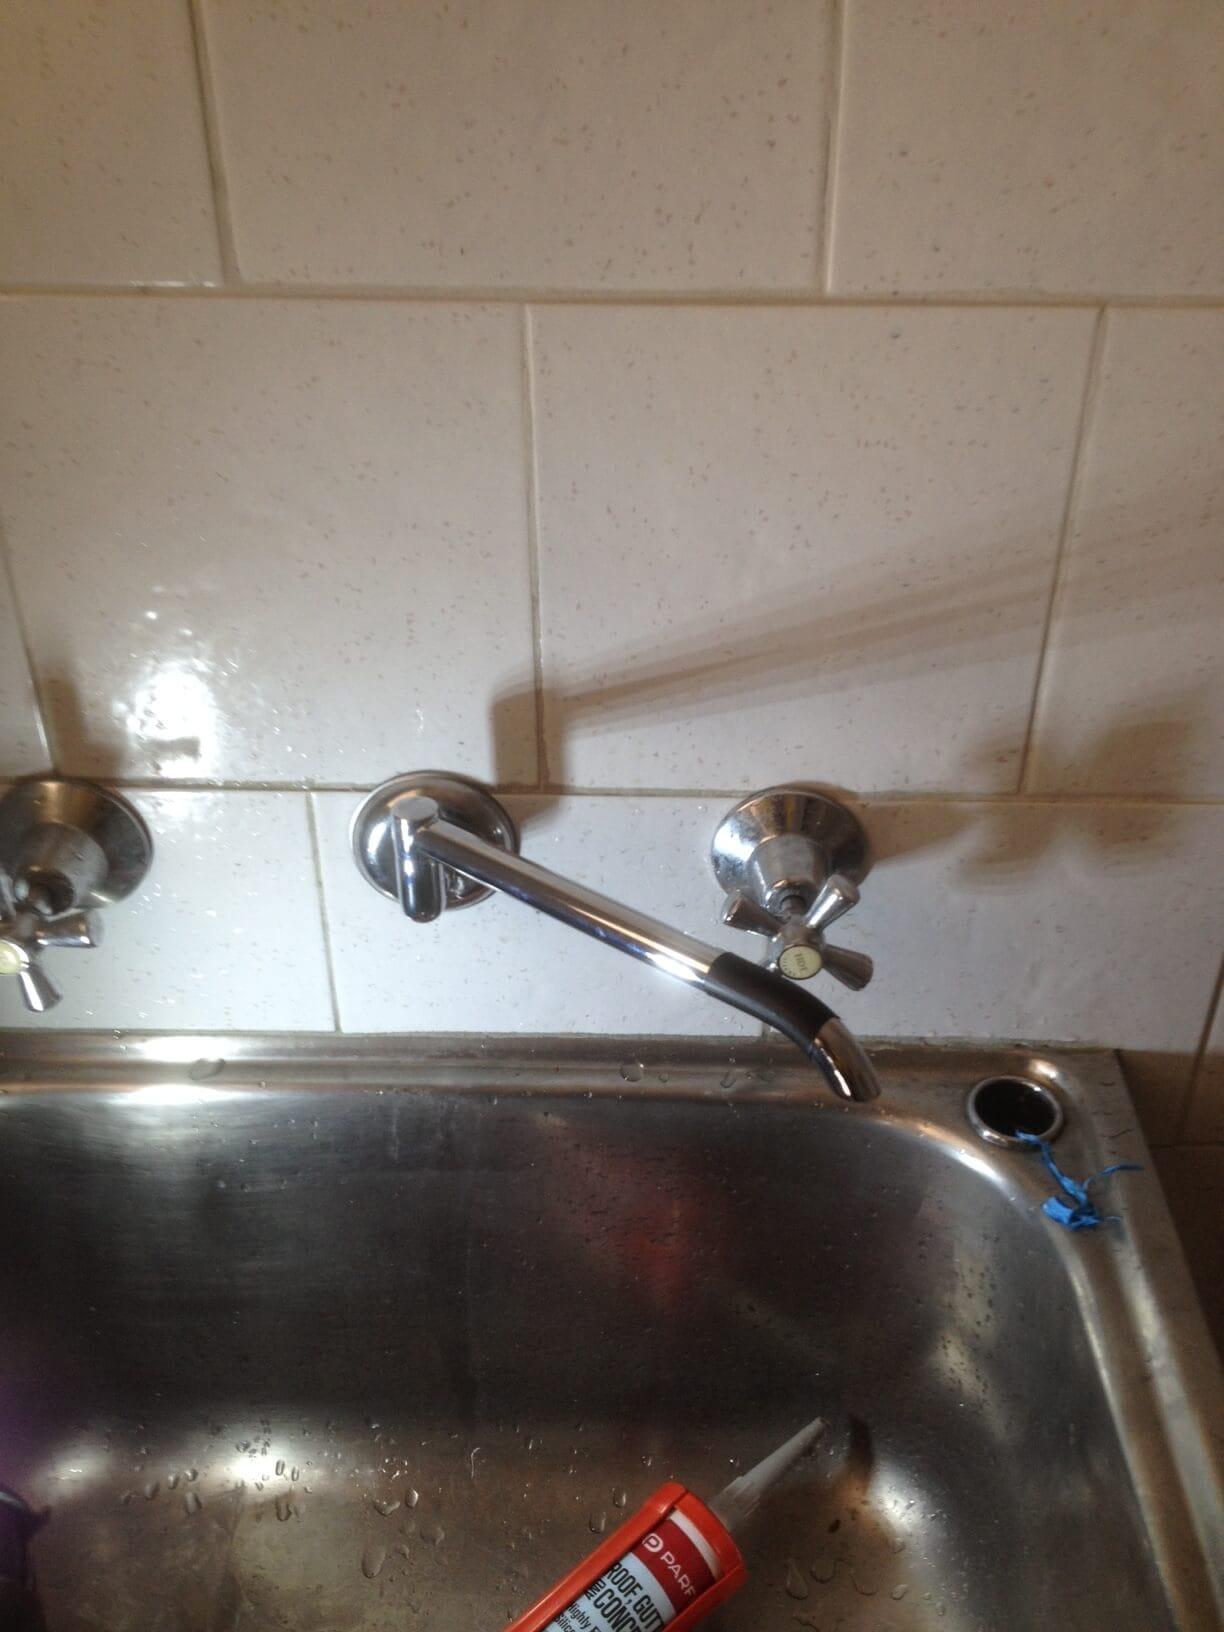 Everyday Plumbers Leaking Tap Repairs - Movable Faucet in Combination Water Source Repair 2306